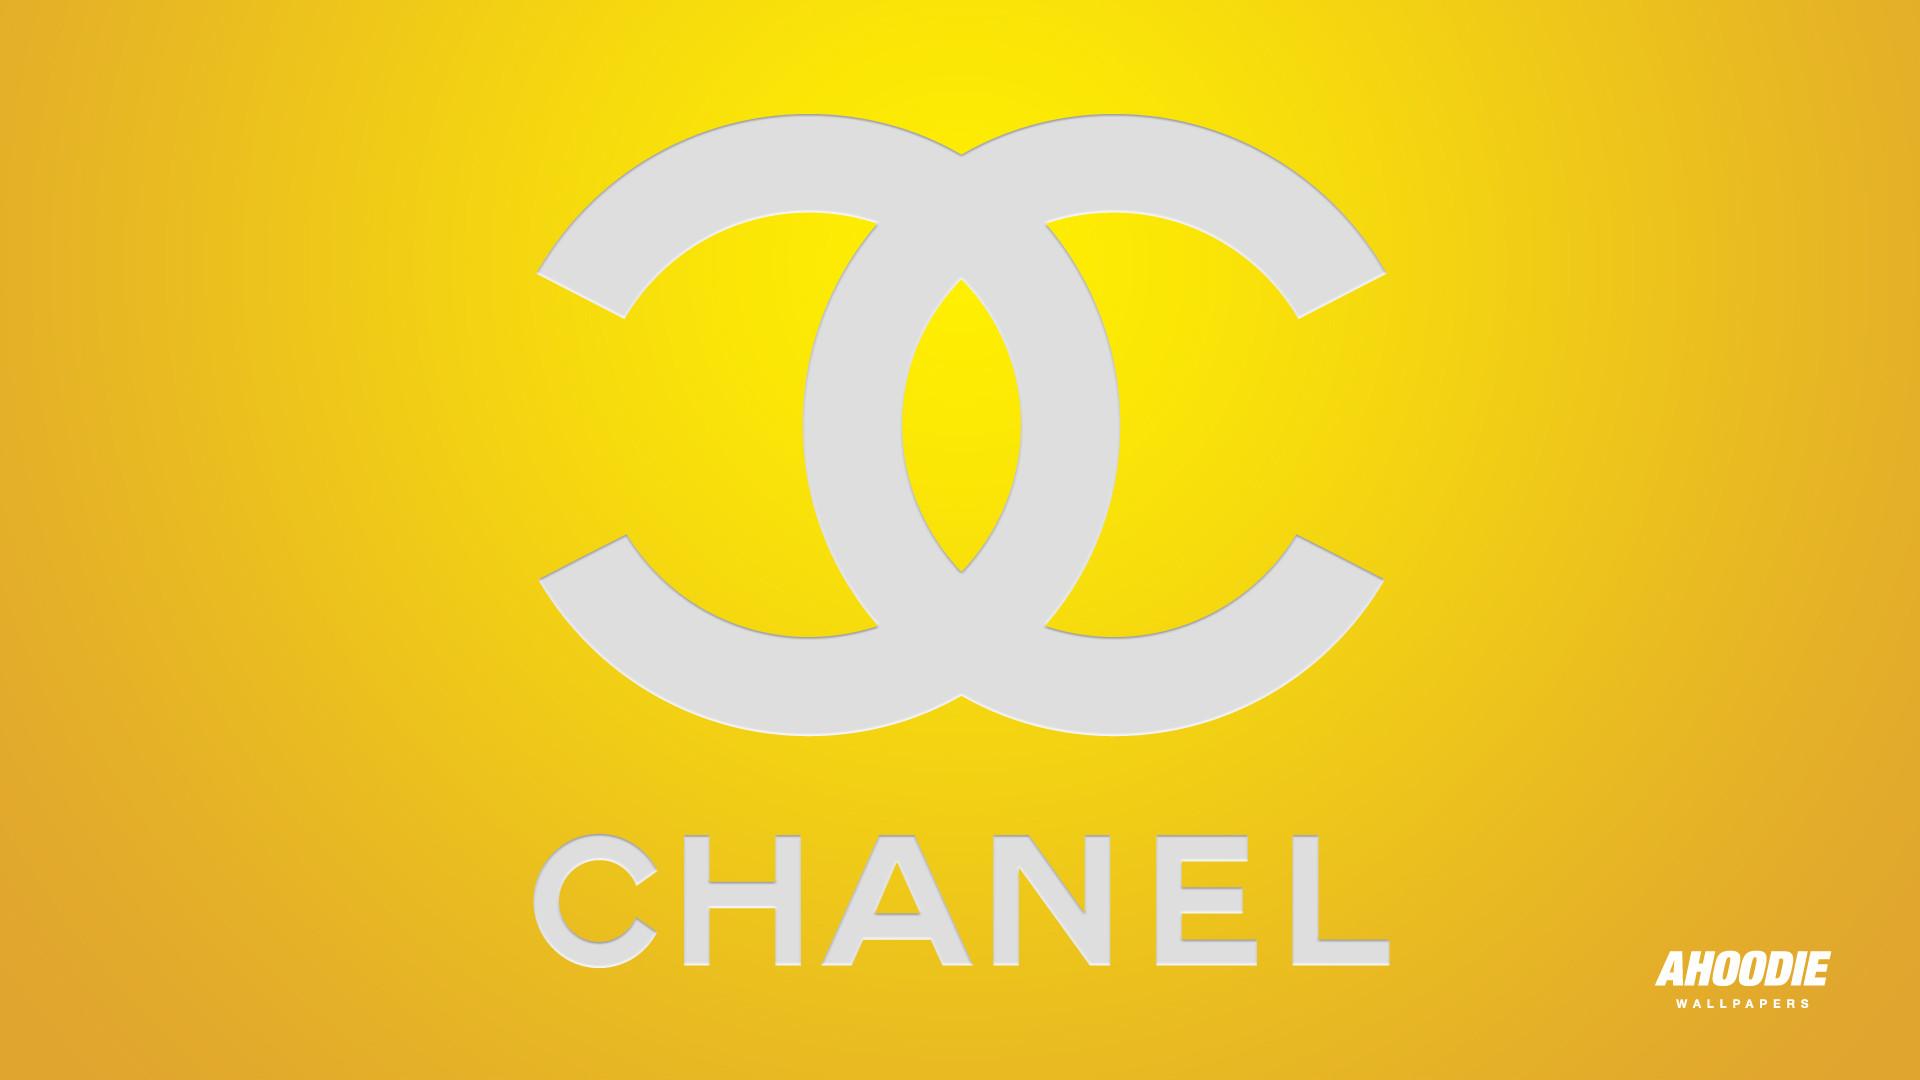 554570 download chanel logo wallpaper 1920x1080 for samsung